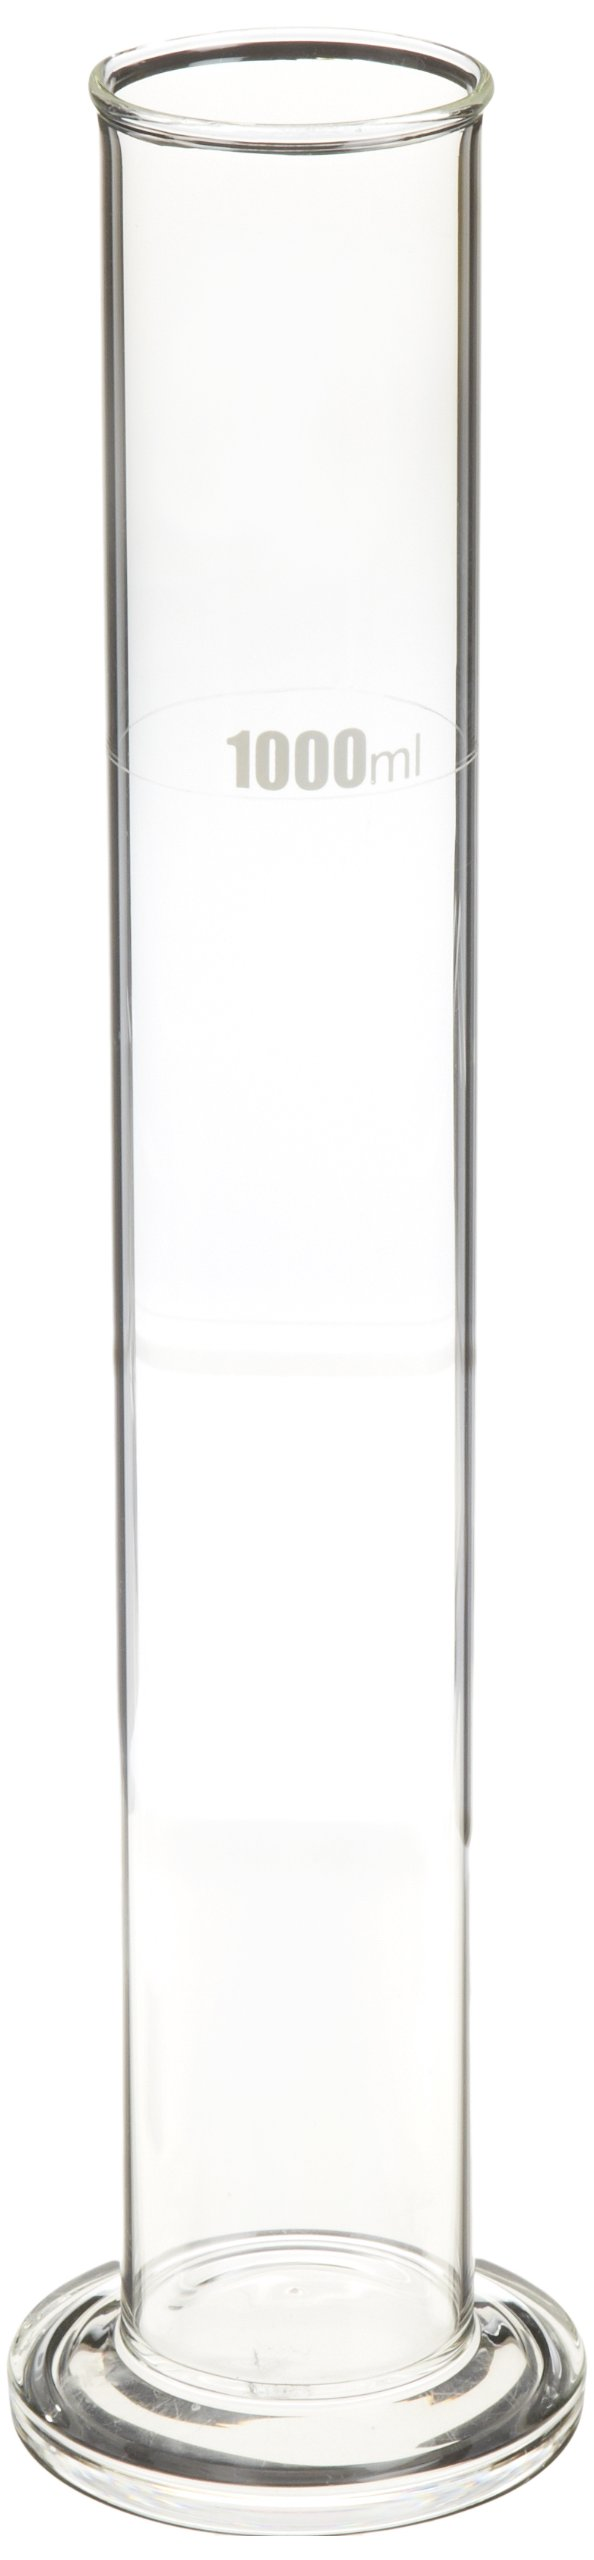 United Scientific HYC1200 Borosilicate Glass Hydrometer Cylinder, 1200ml Capacity